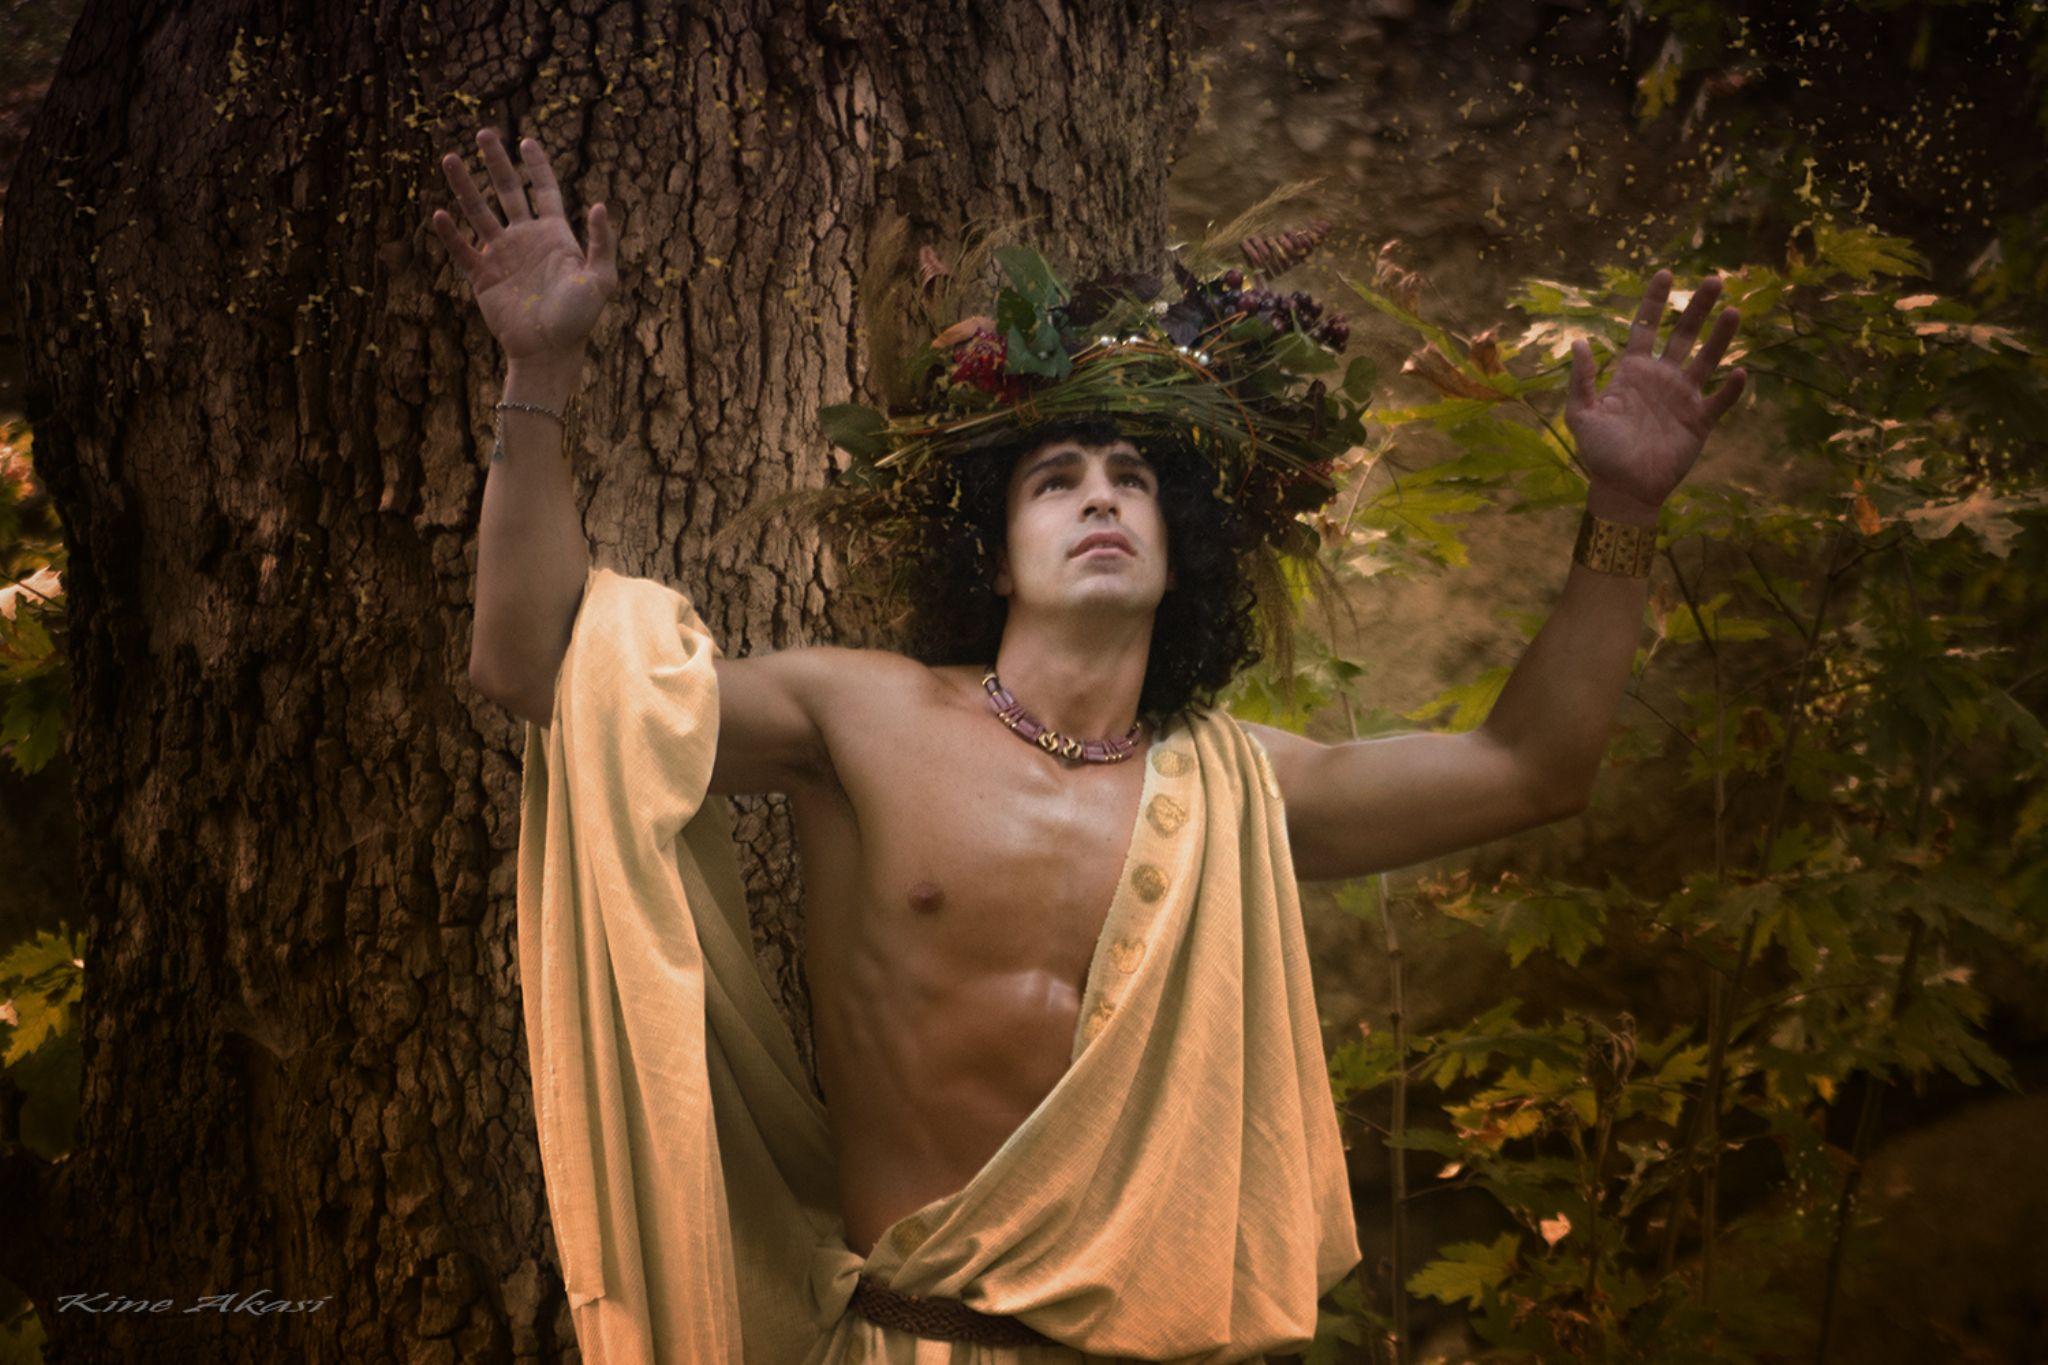 Dionysus by KineAkasi